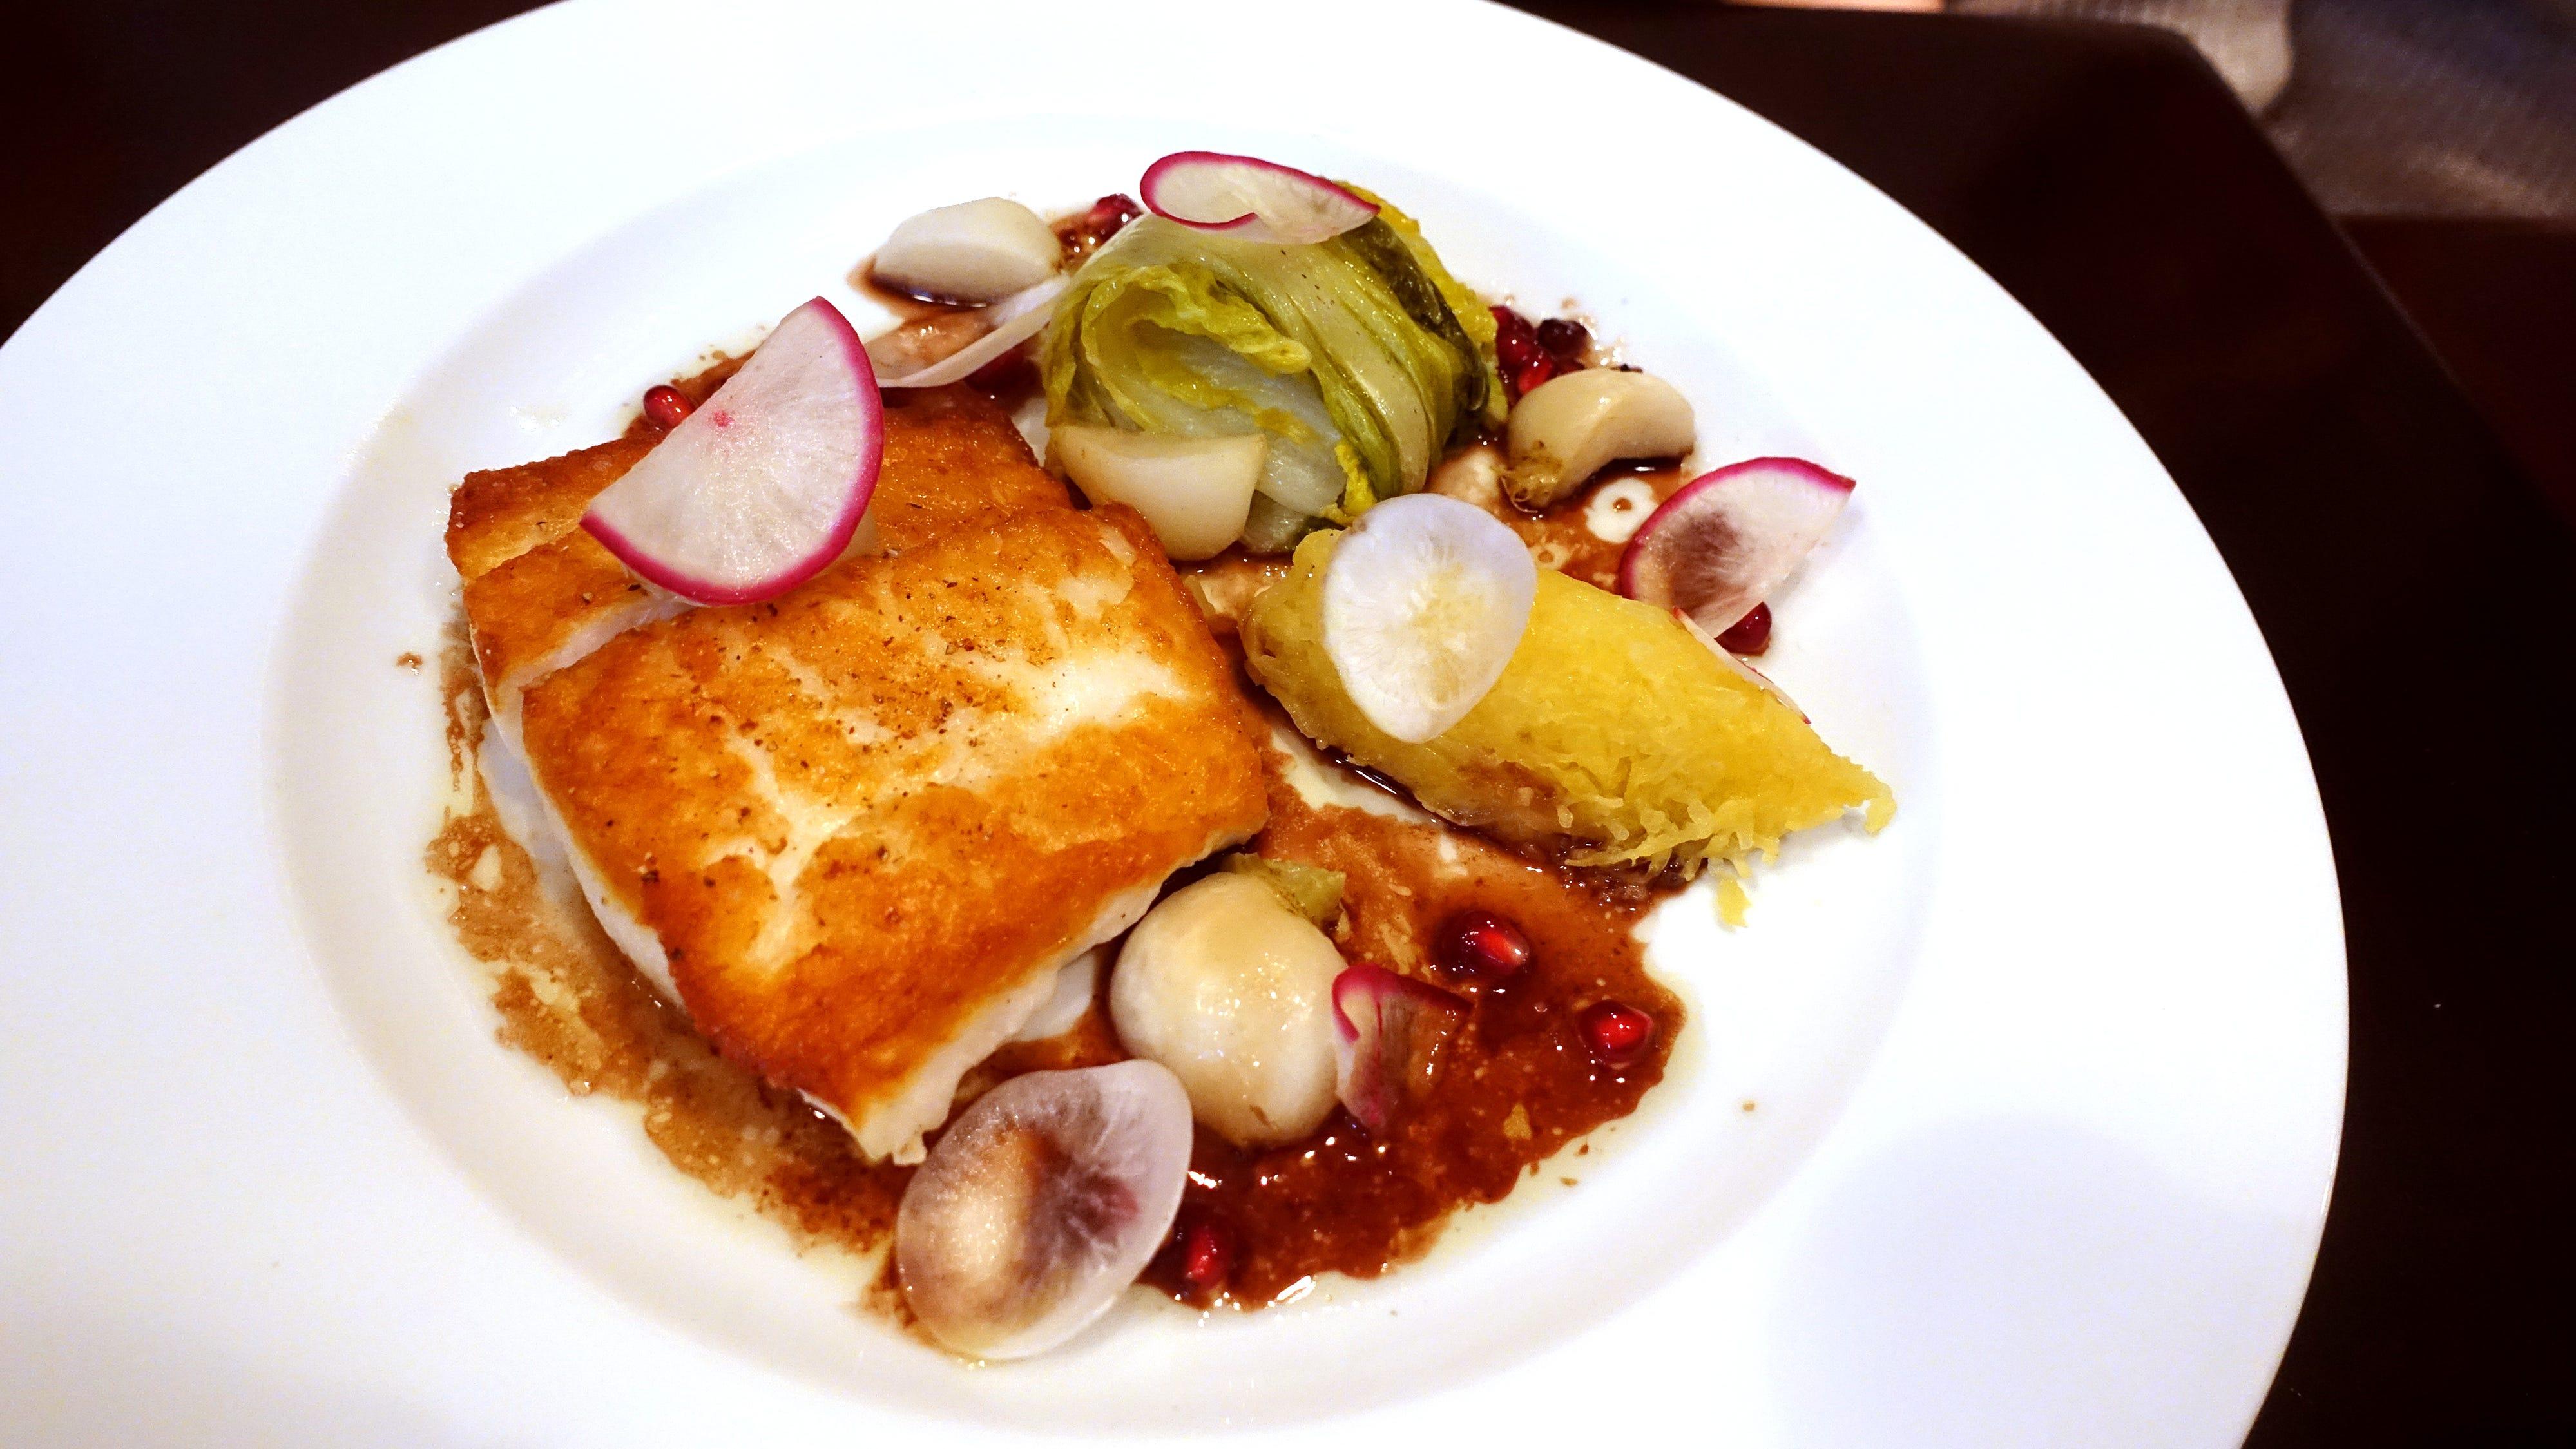 Fluke with turnip, napa cabbage, spaghetti squash and pomegranate at Confluence in Carefree, AZ.